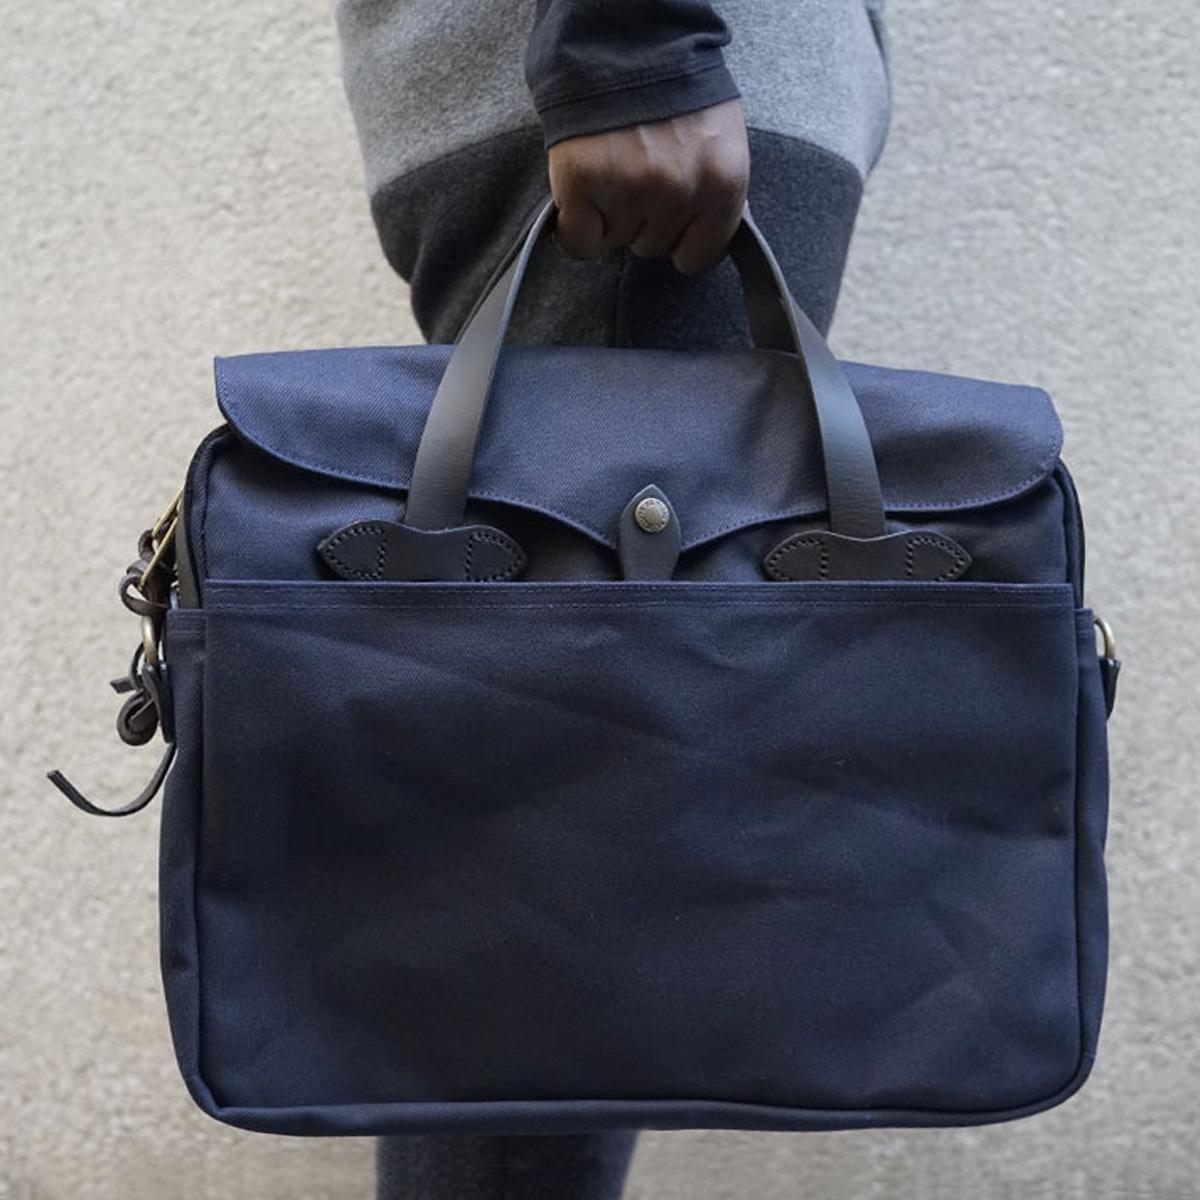 Filson Original Briefcase 11070256 Navy, extraordinary bag for an ordinary day